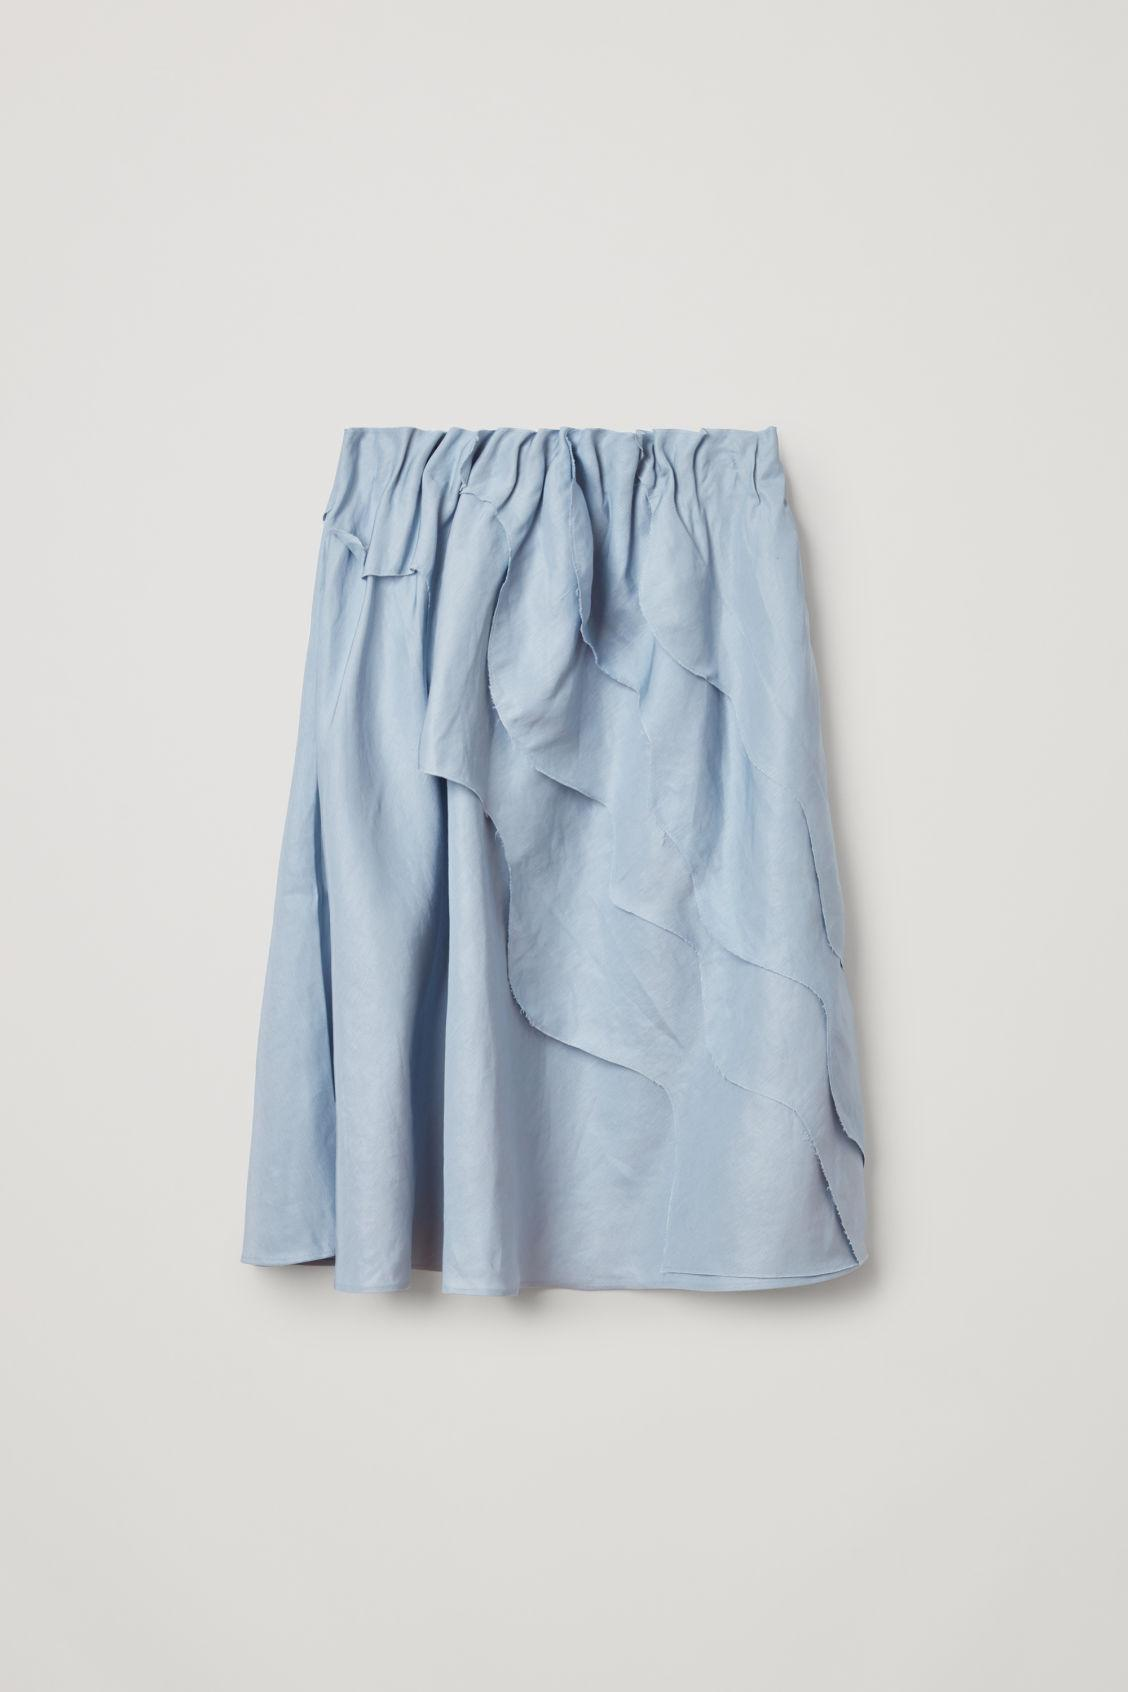 Mixed Textured Ruffle Skirt